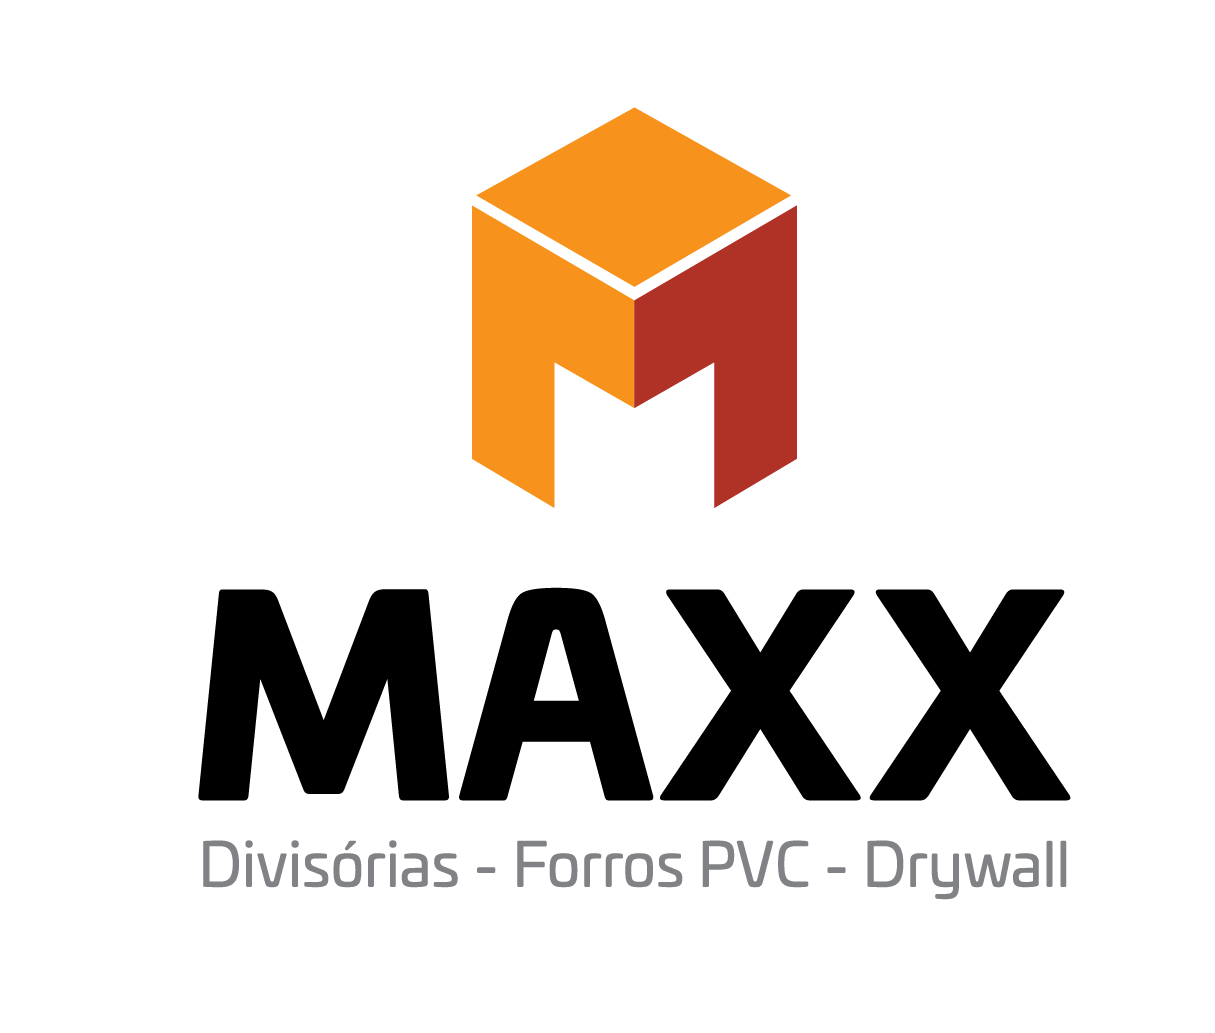 Onde Comprar Forro de Pvc Madeira Água Rasa - Forro de Pvc Marrom - Maxx Forro